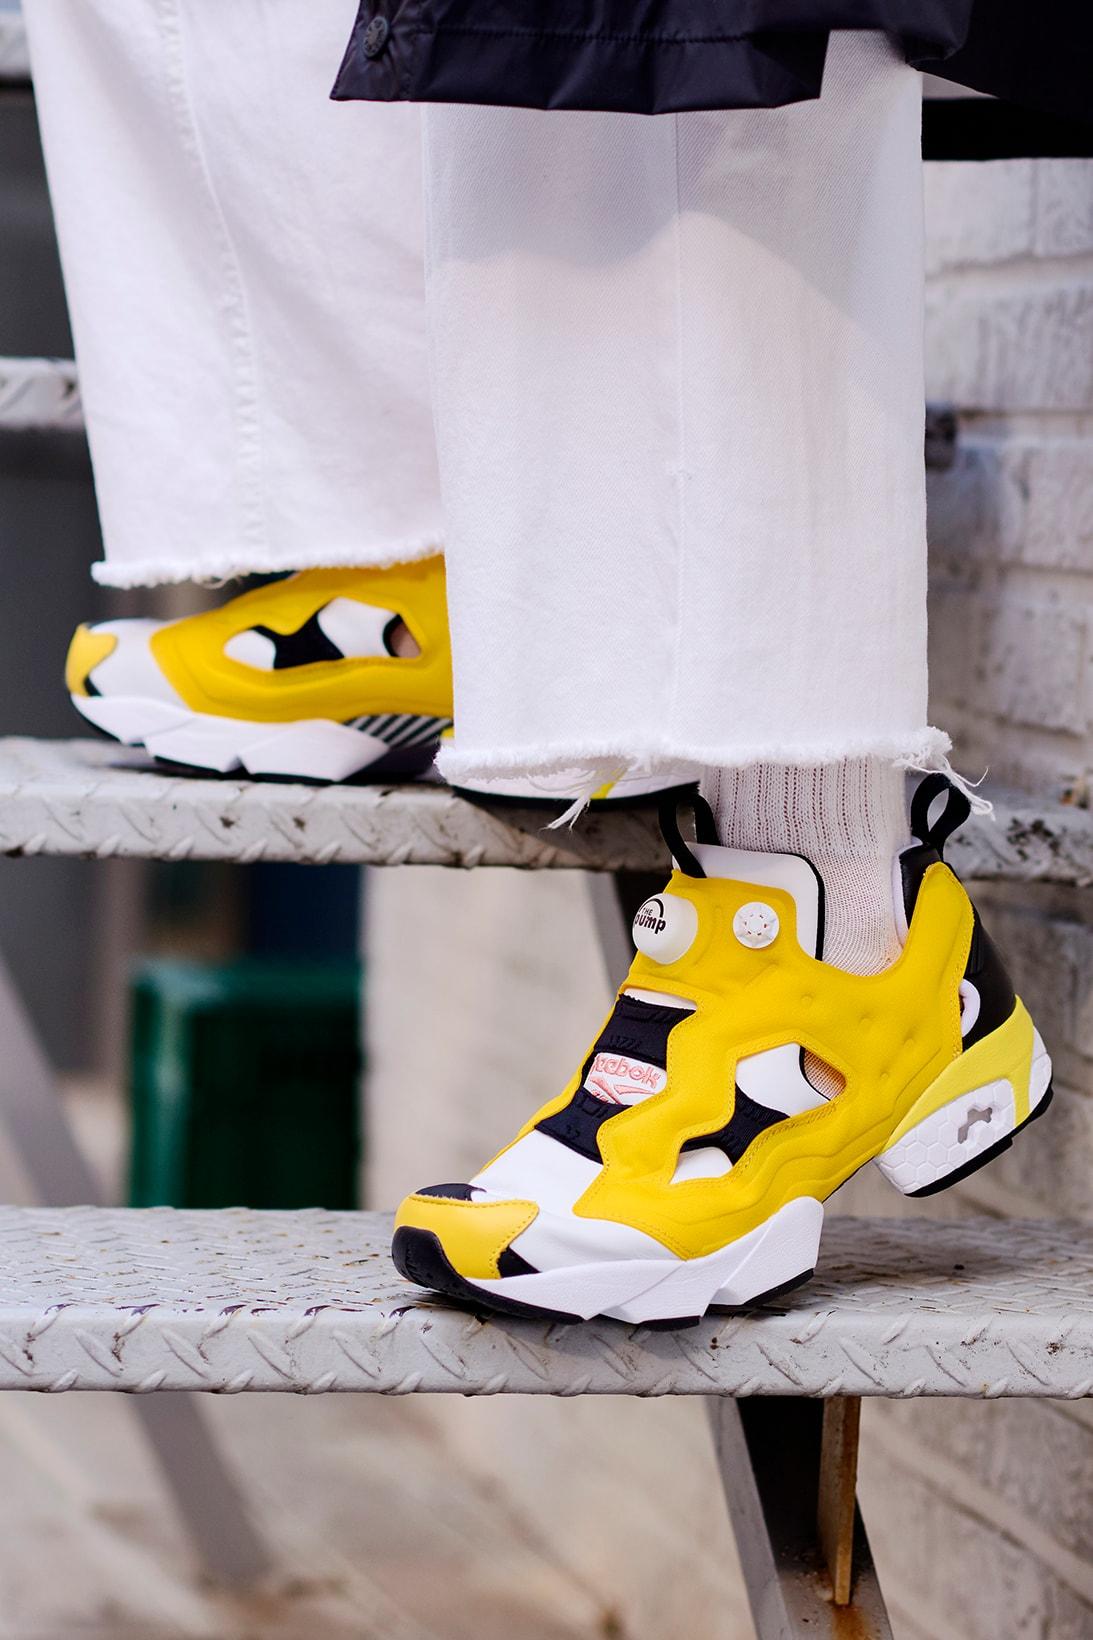 Sentido táctil entrar Saco  BT21 LINE FRIENDS x Reebok Instapump Fury Sneakers | HYPEBAE